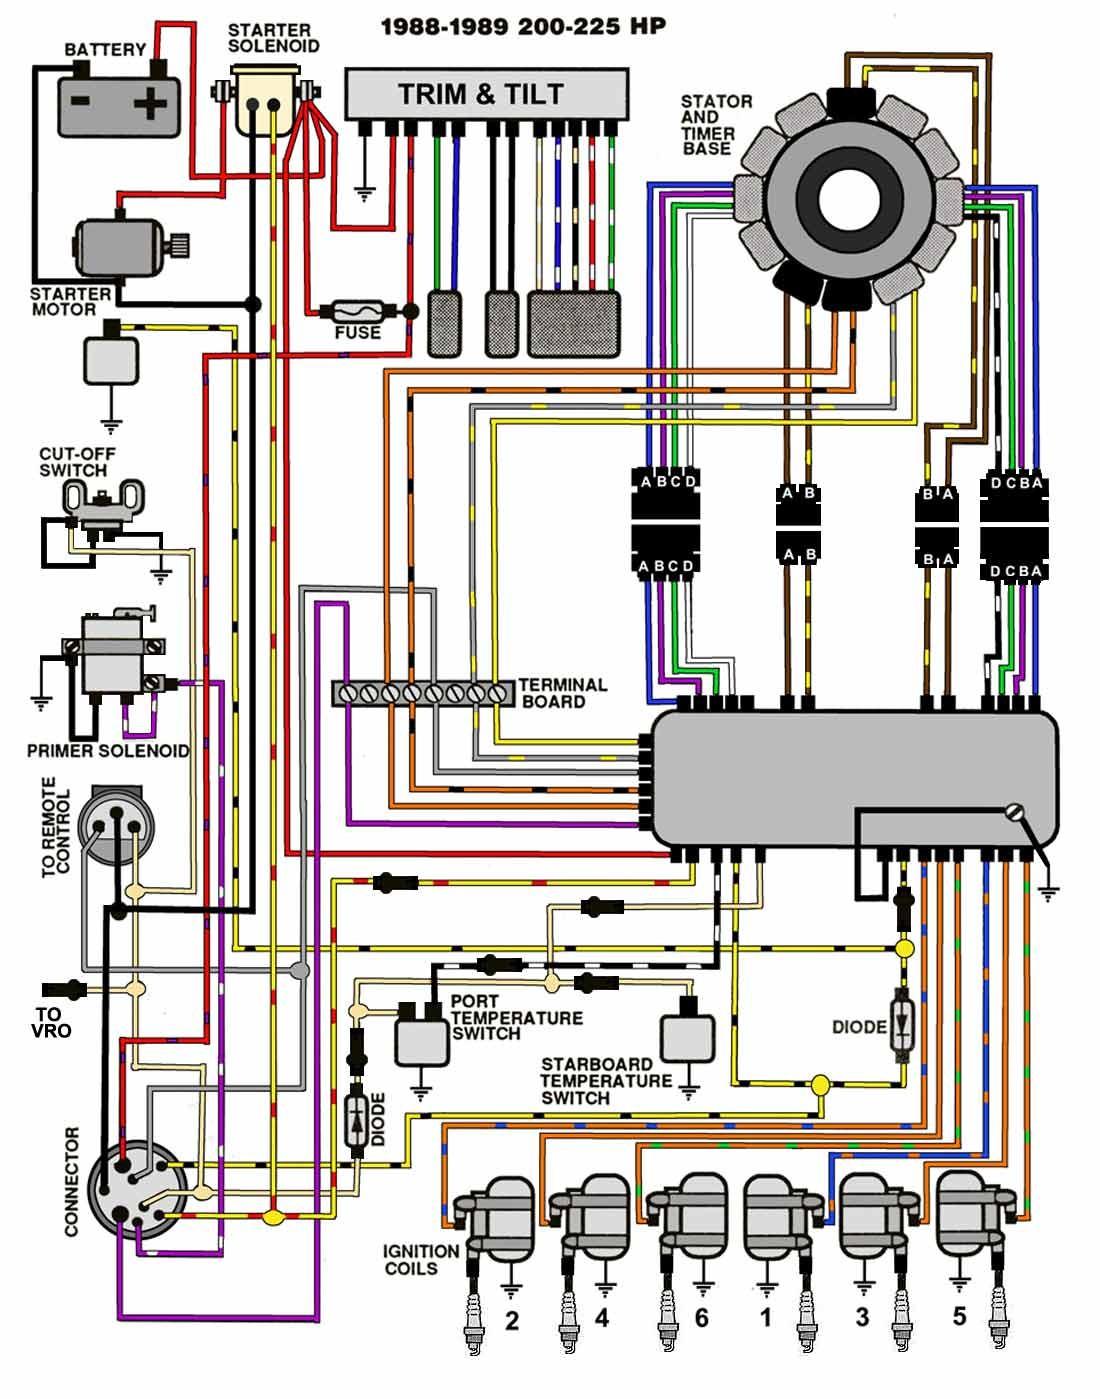 3 Pole Starter Solenoid Wiring Diagram 1999 Evinrude from mainetreasurechest.com